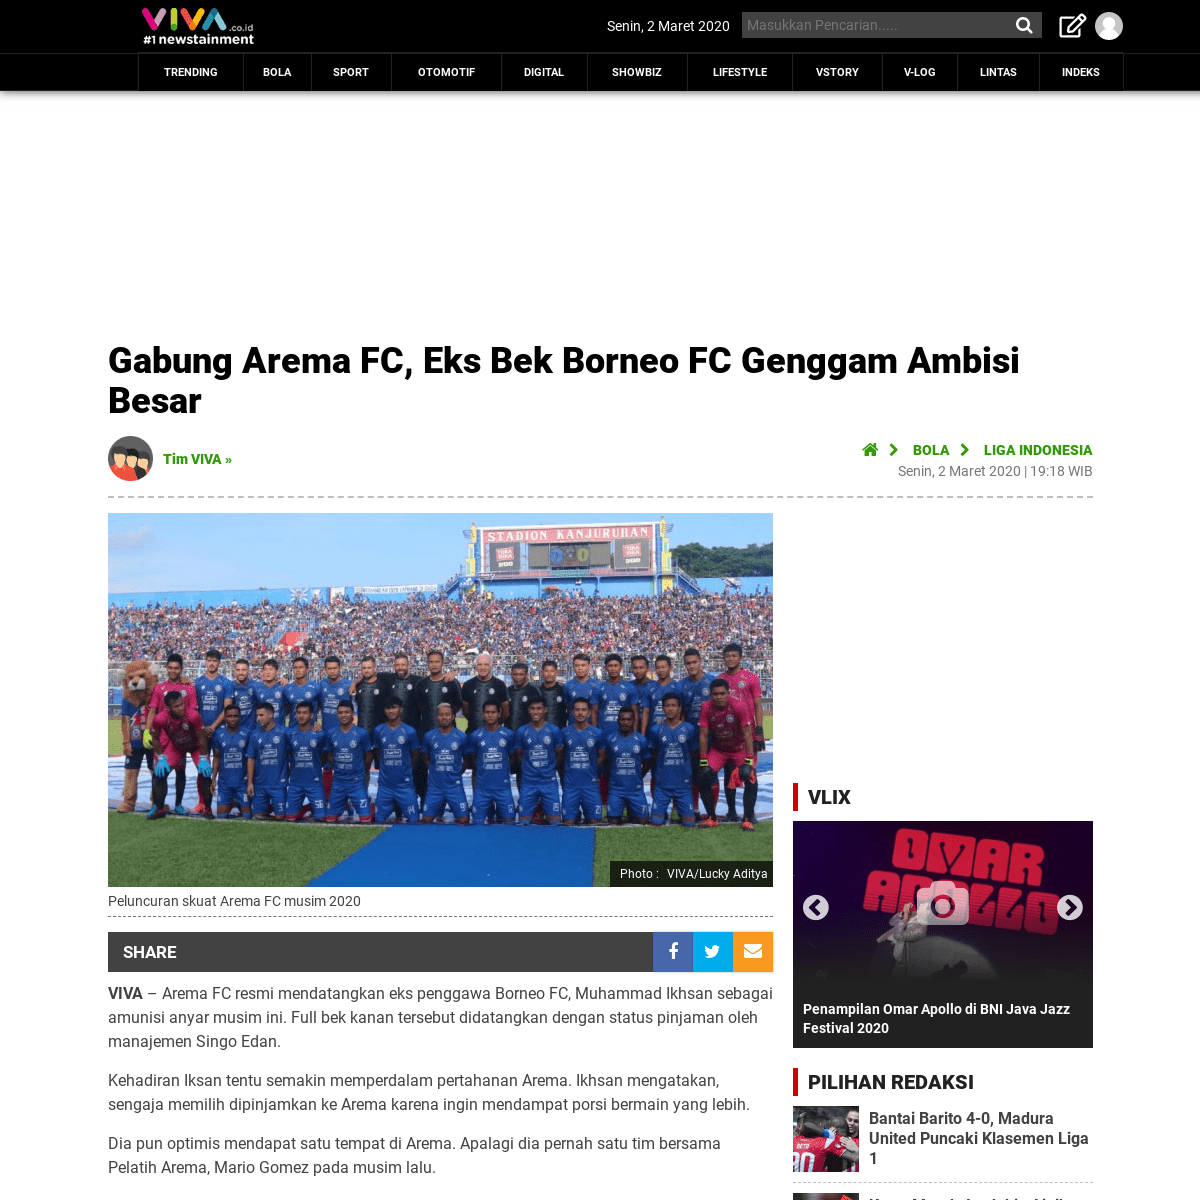 Gabung Arema FC, Eks Bek Borneo FC Genggam Ambisi Besar - VIVA